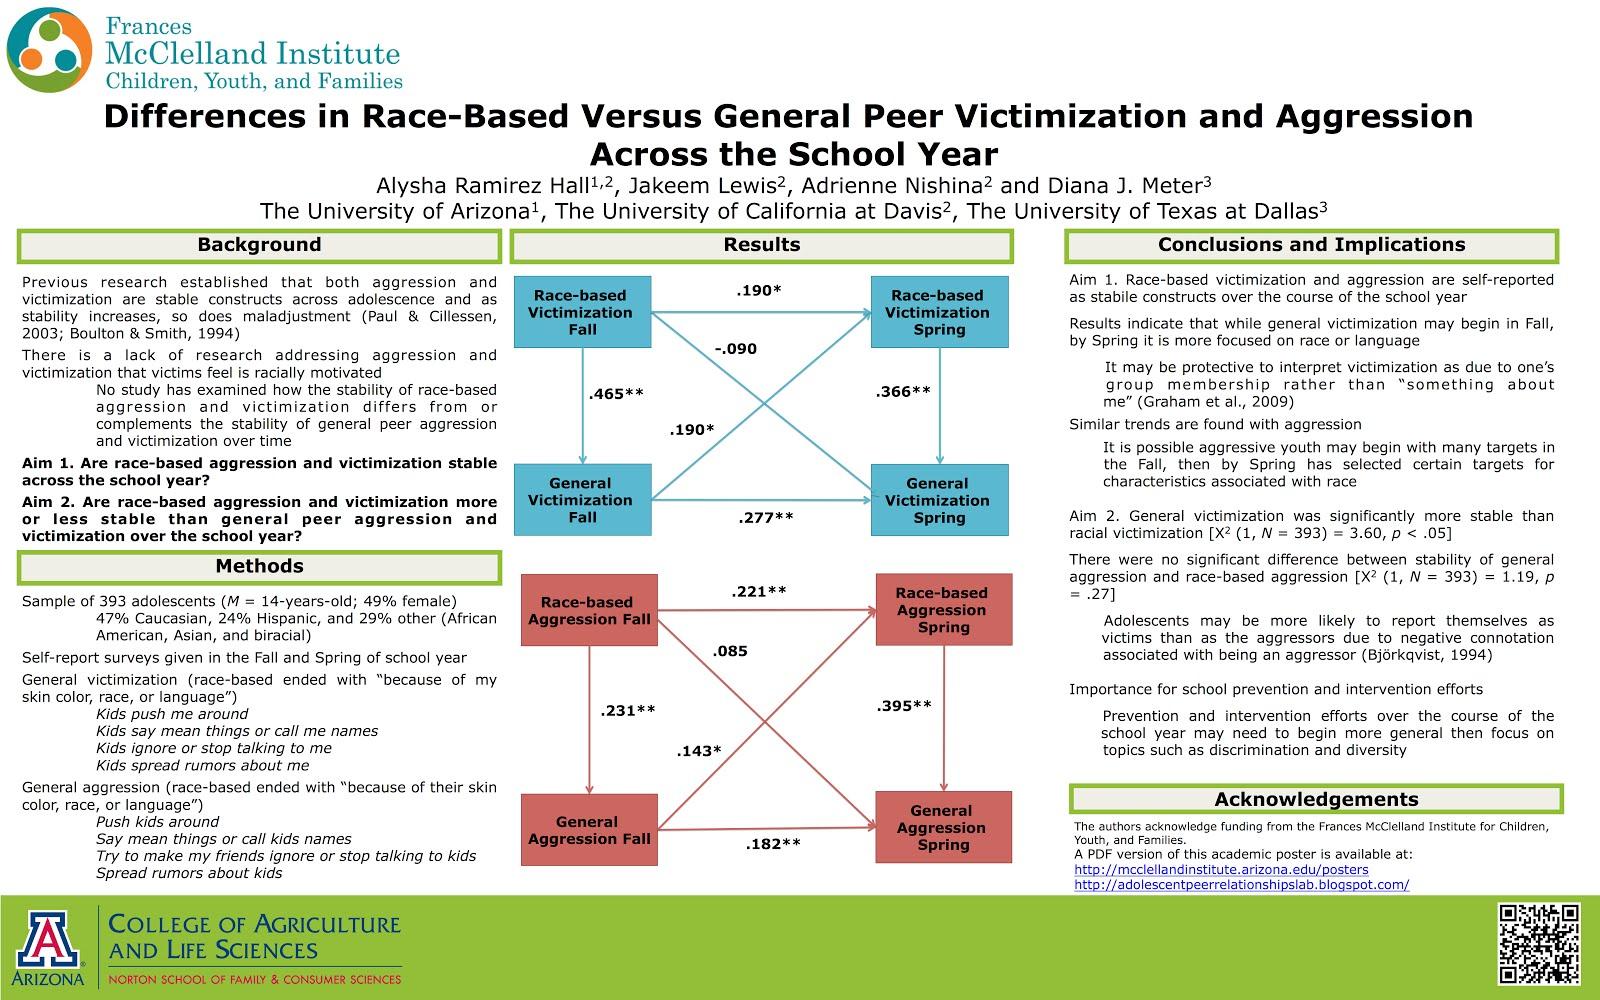 Ramirez Hall, Lewis, Nishina, Meter_Racial Aggression and Victimization.jpg